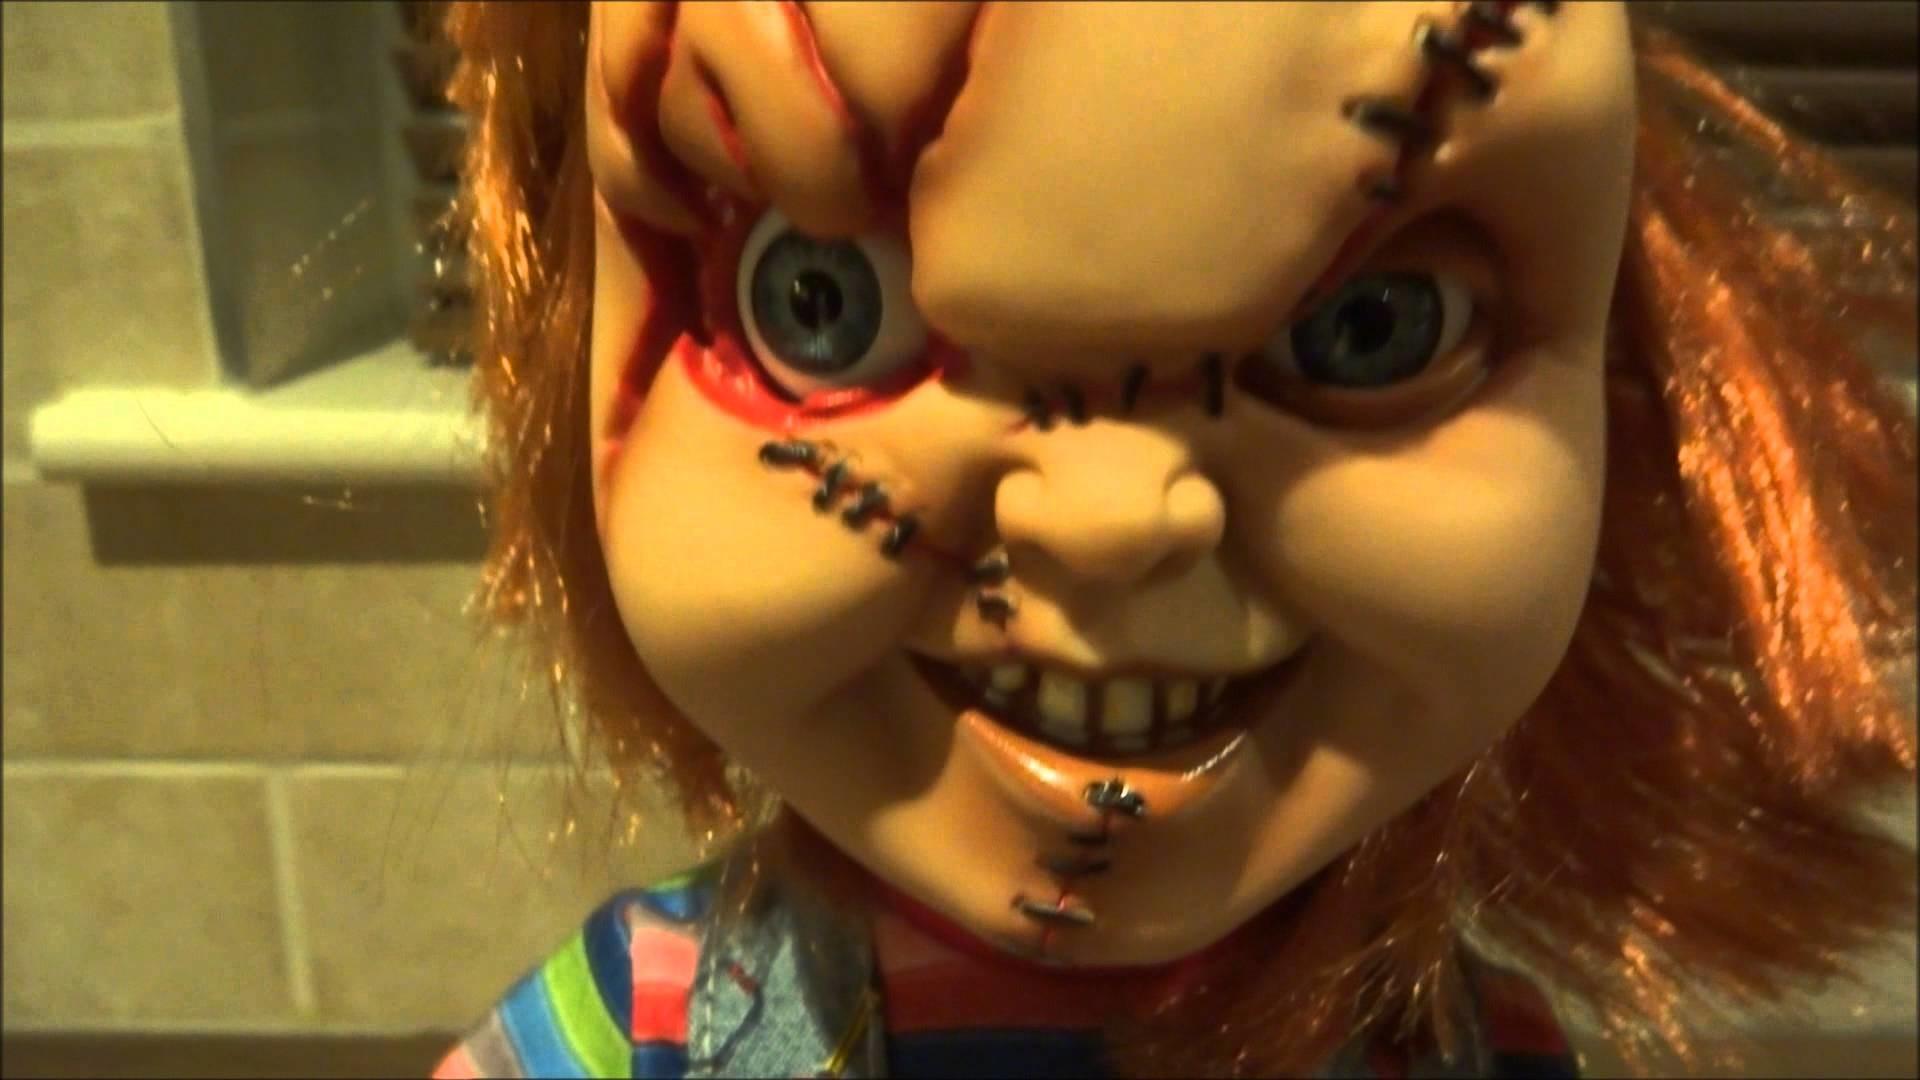 Chucky Doll 15 inch by Mezco